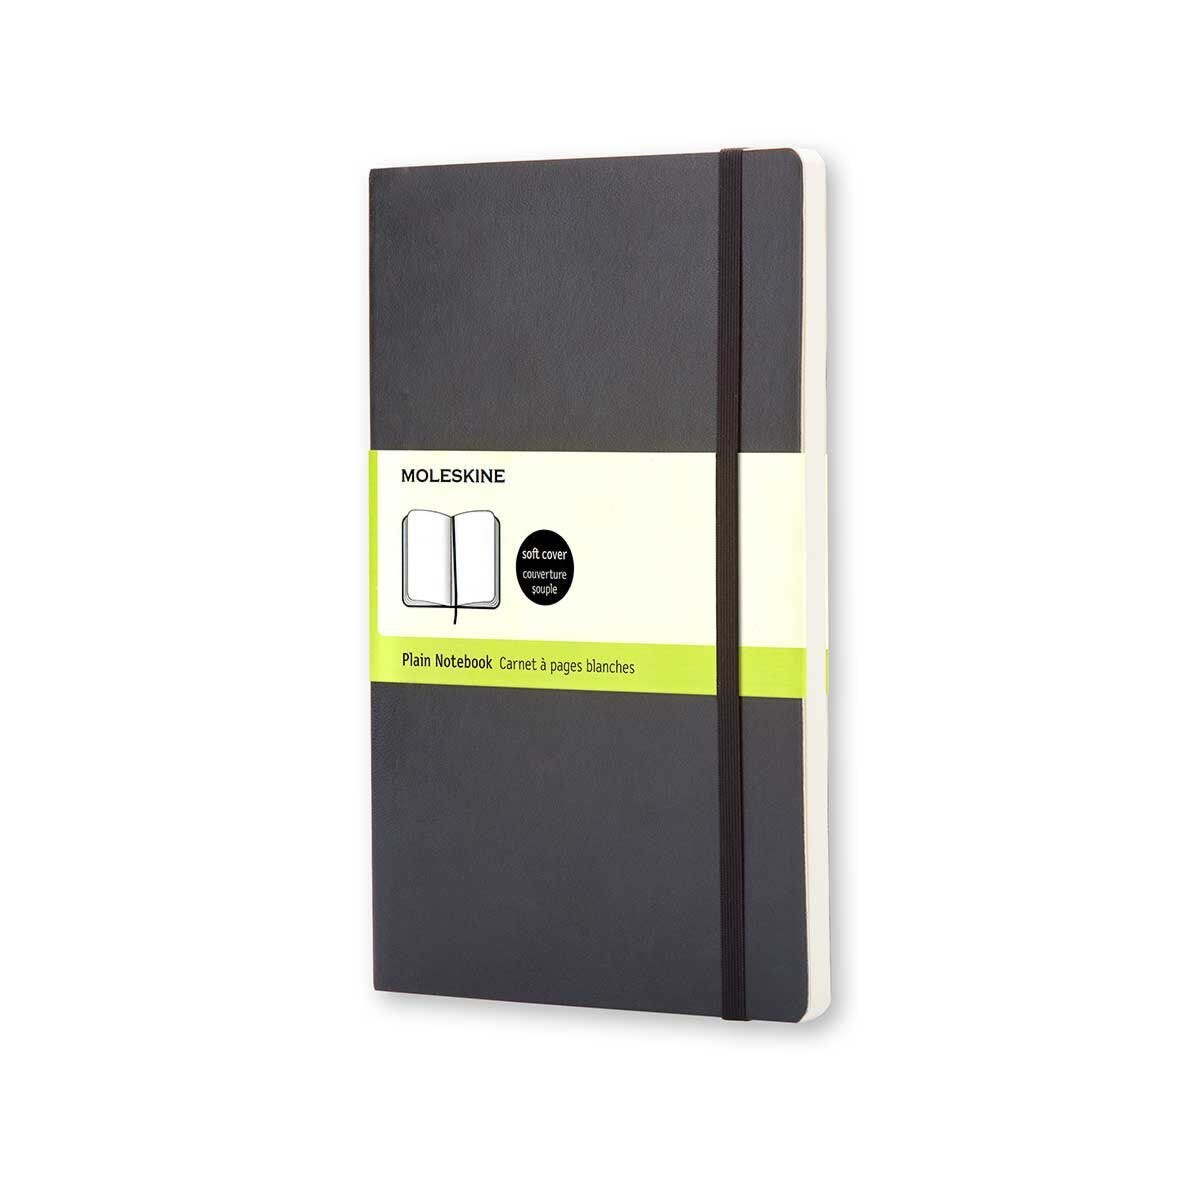 Moleskine Soft Cover Plain Pocket Notebook 192 Pages 96 Sheets